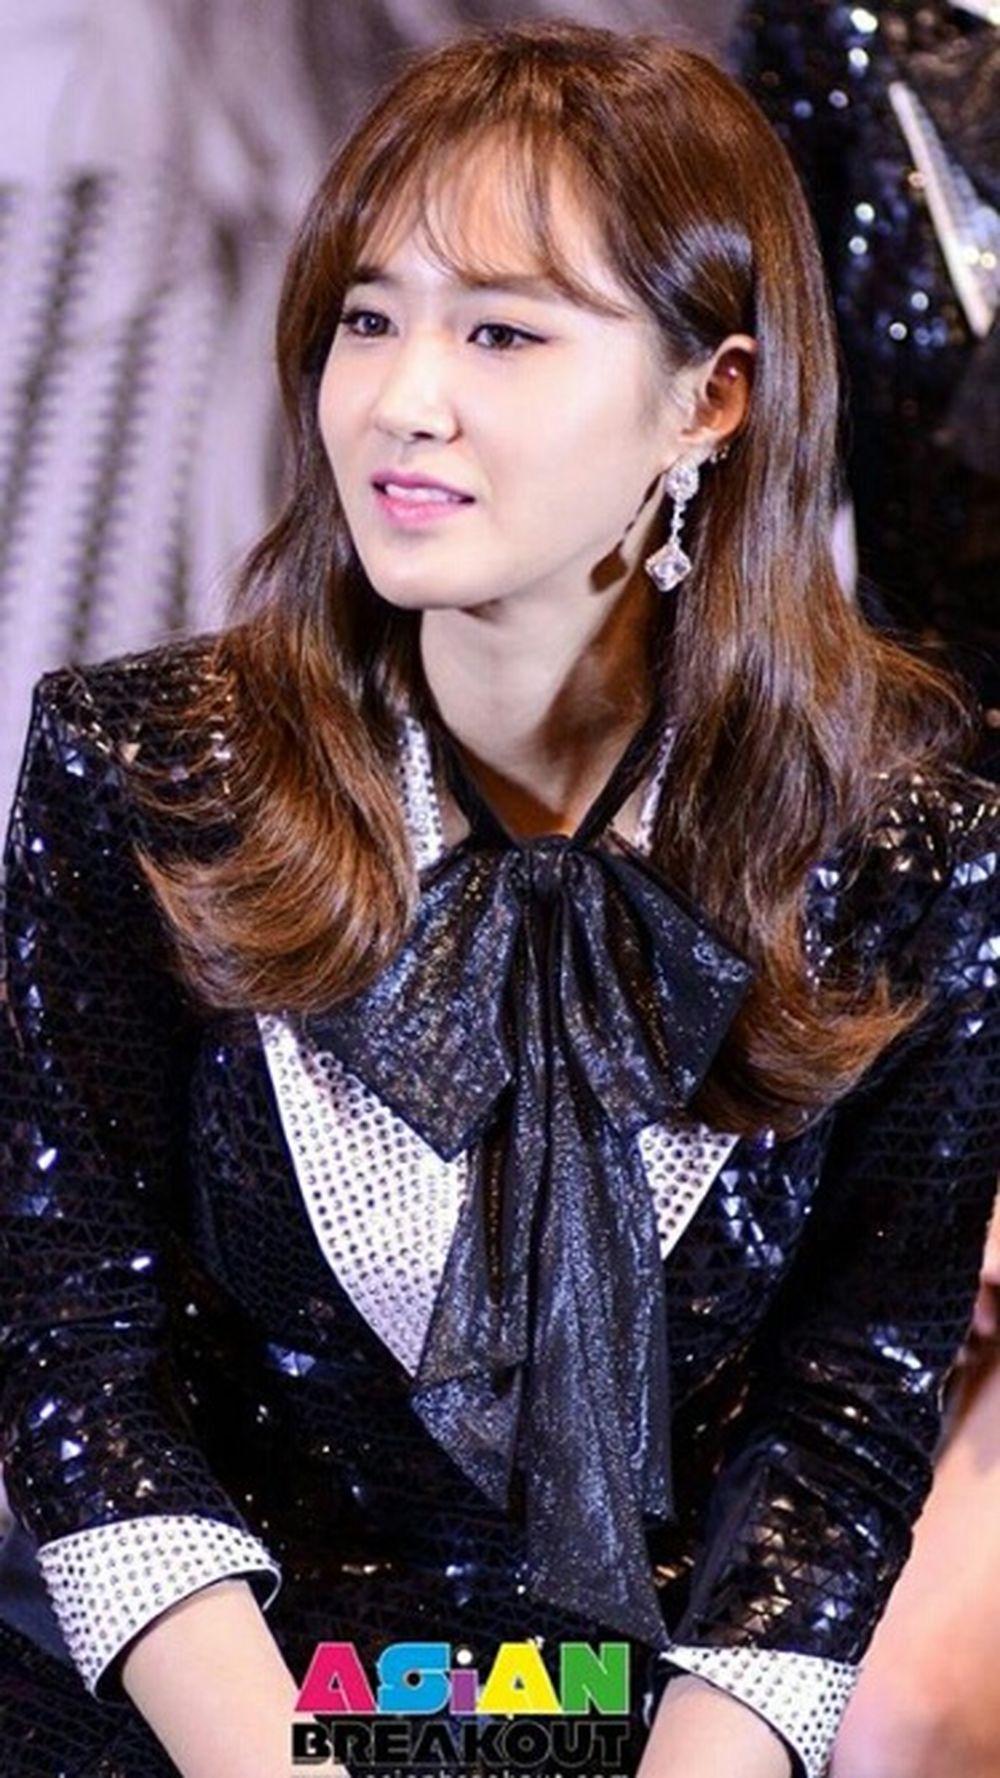 Phantasia In Bangkok Press Conference Thailand THAISONE 소녀시대 CatchGG Yurikwon BlackPearl